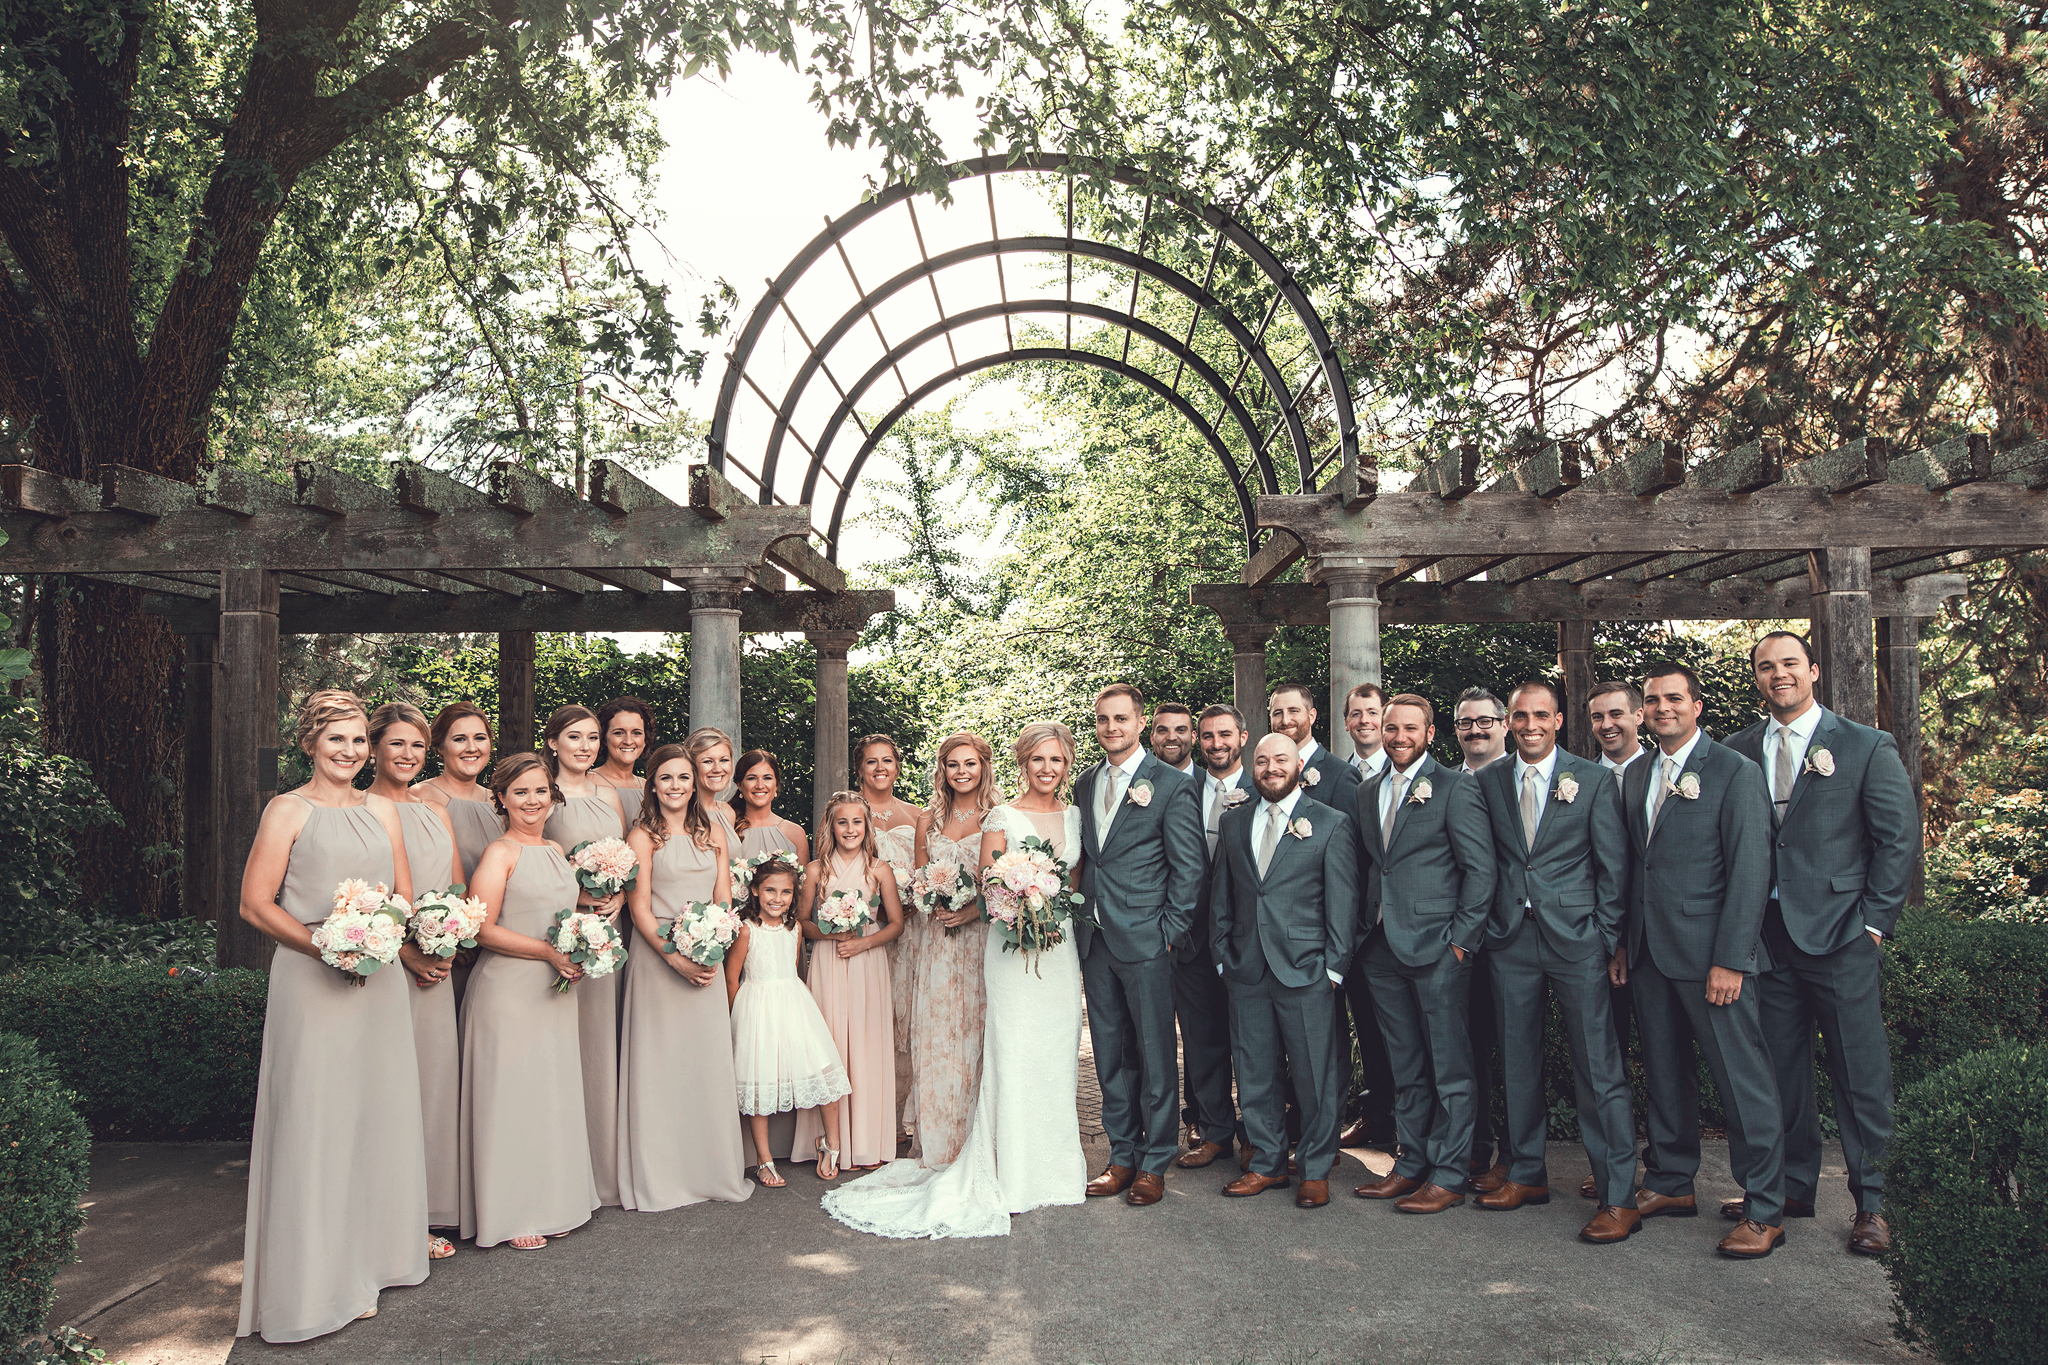 Cincinnati-Dayton-OH-Traveling-Wedding-Photographer-Rhinegeist-Brewery-Ault-Park-21C-79.jpg